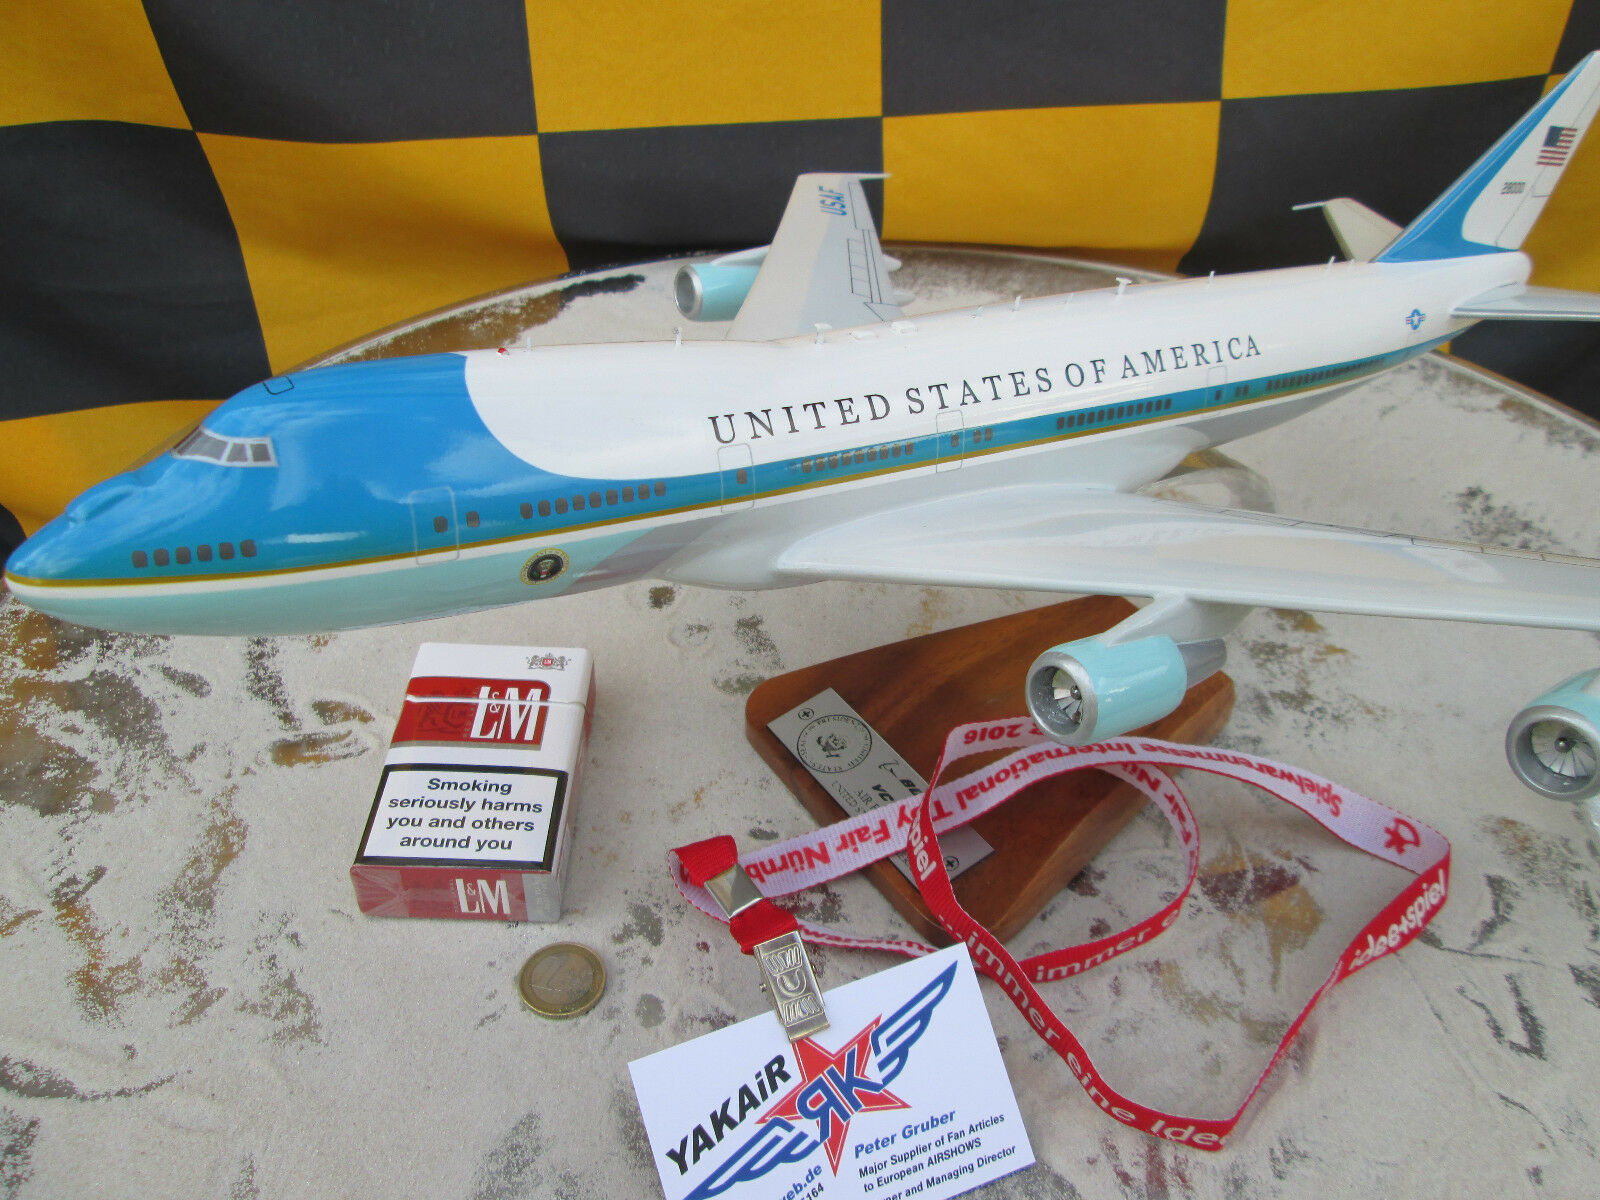 Boeing  Air Force One XXL B 747 Jumbojet   Avion   Aircraft   YakAir